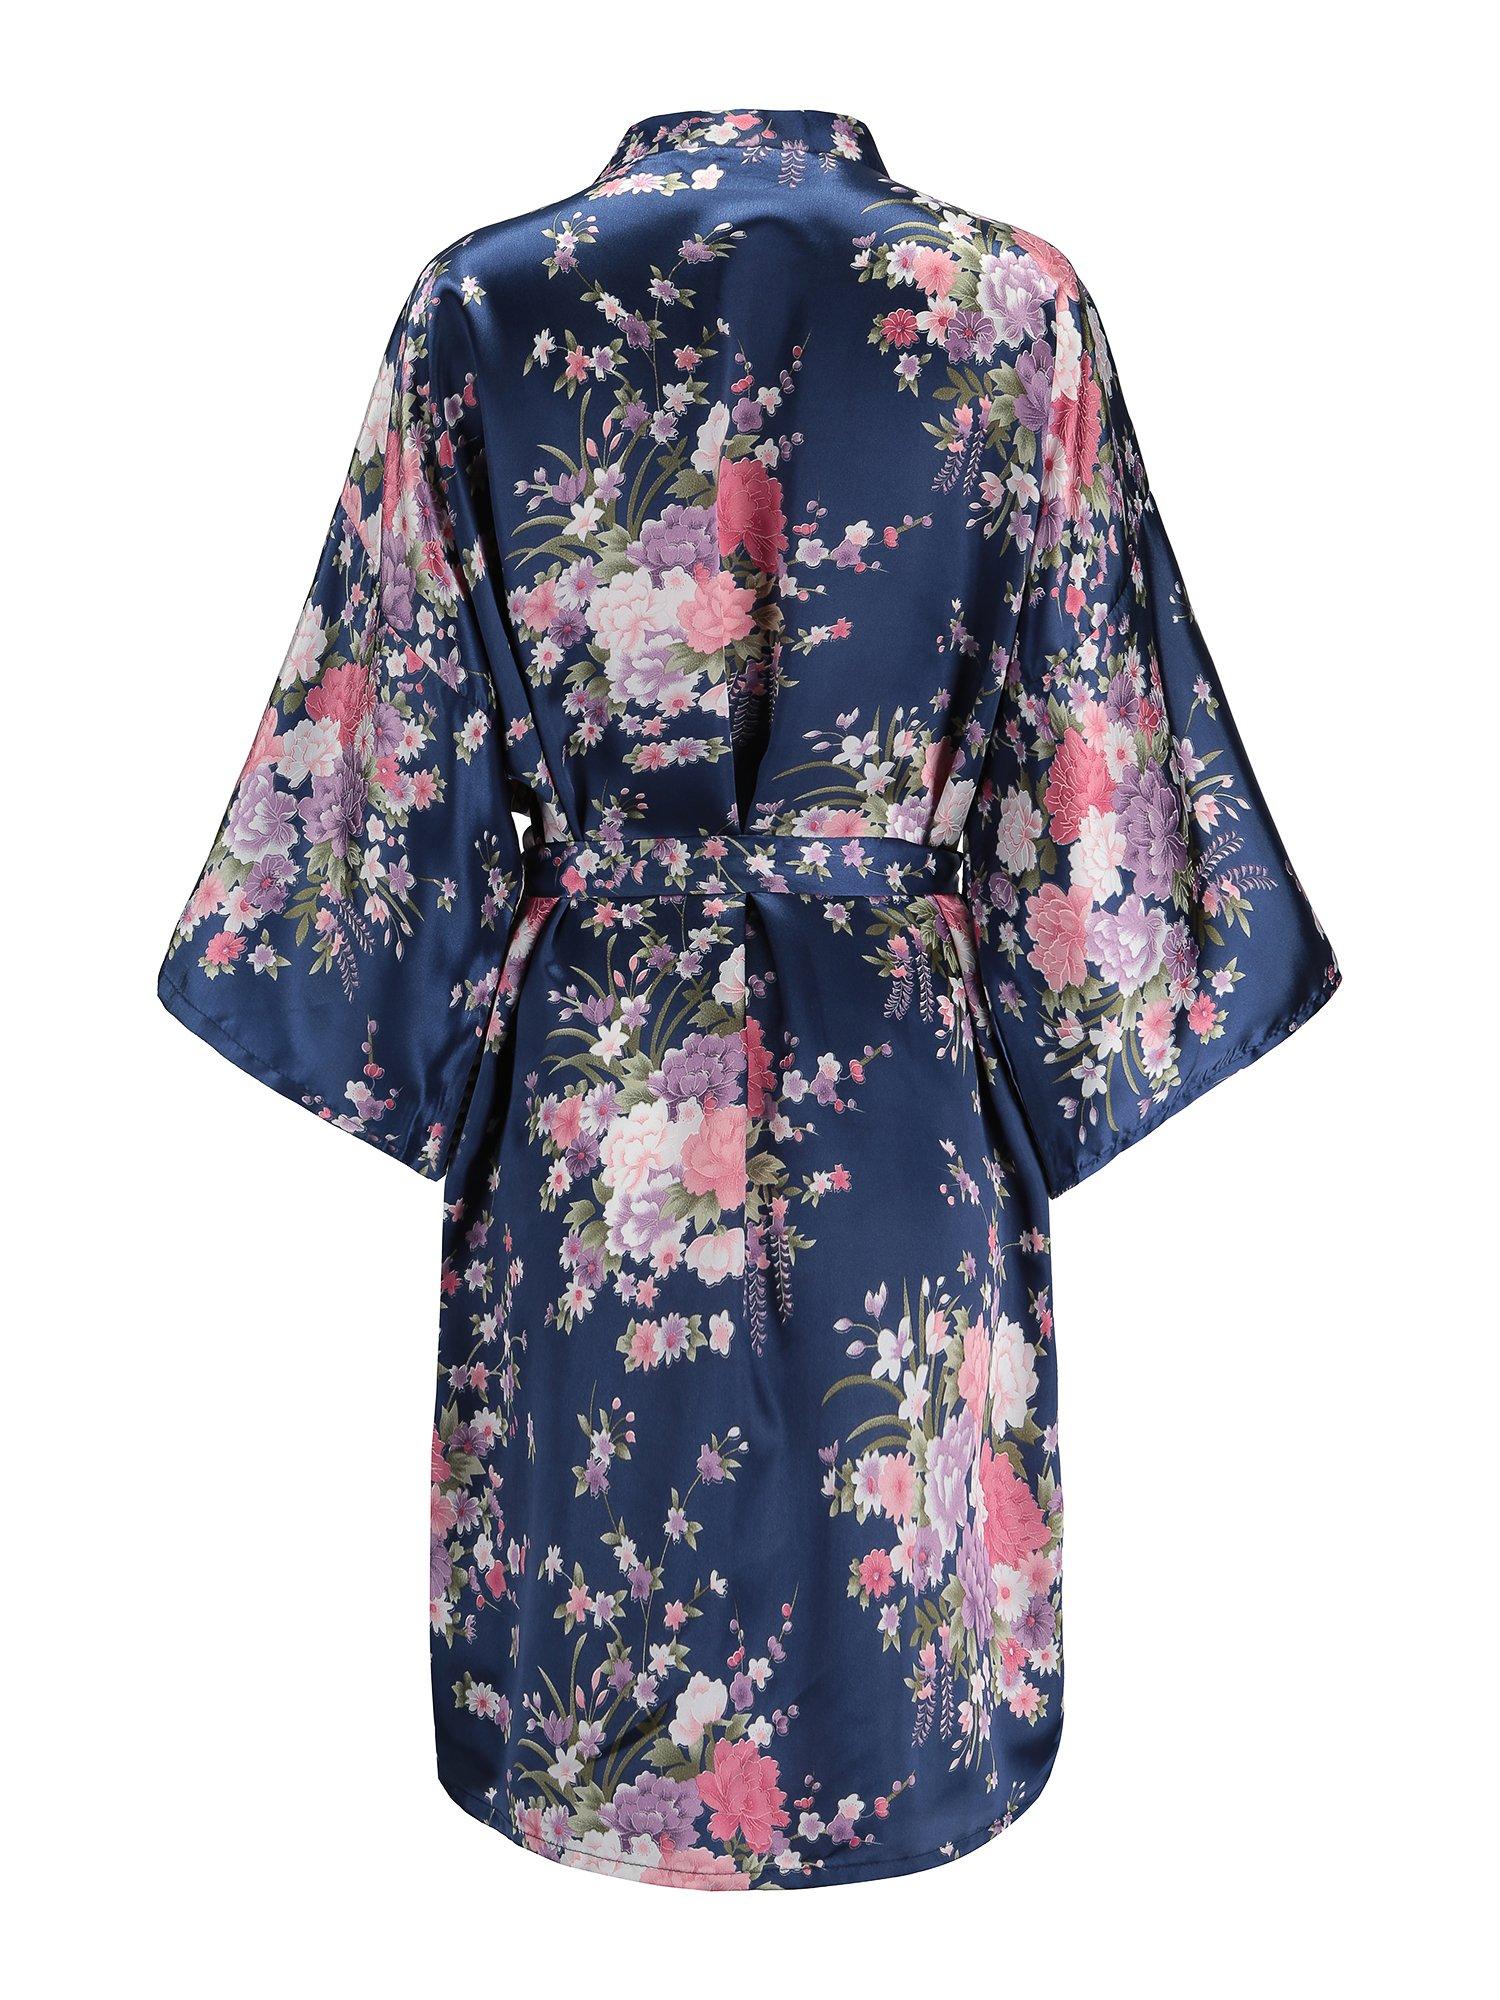 81b3db5f9e EPLAZA Women Floral Satin Robe Bridal Dressing Gown Wedding Bride  Bridesmaid Kimono Sleepwear (Navy)   Robes   Clothing